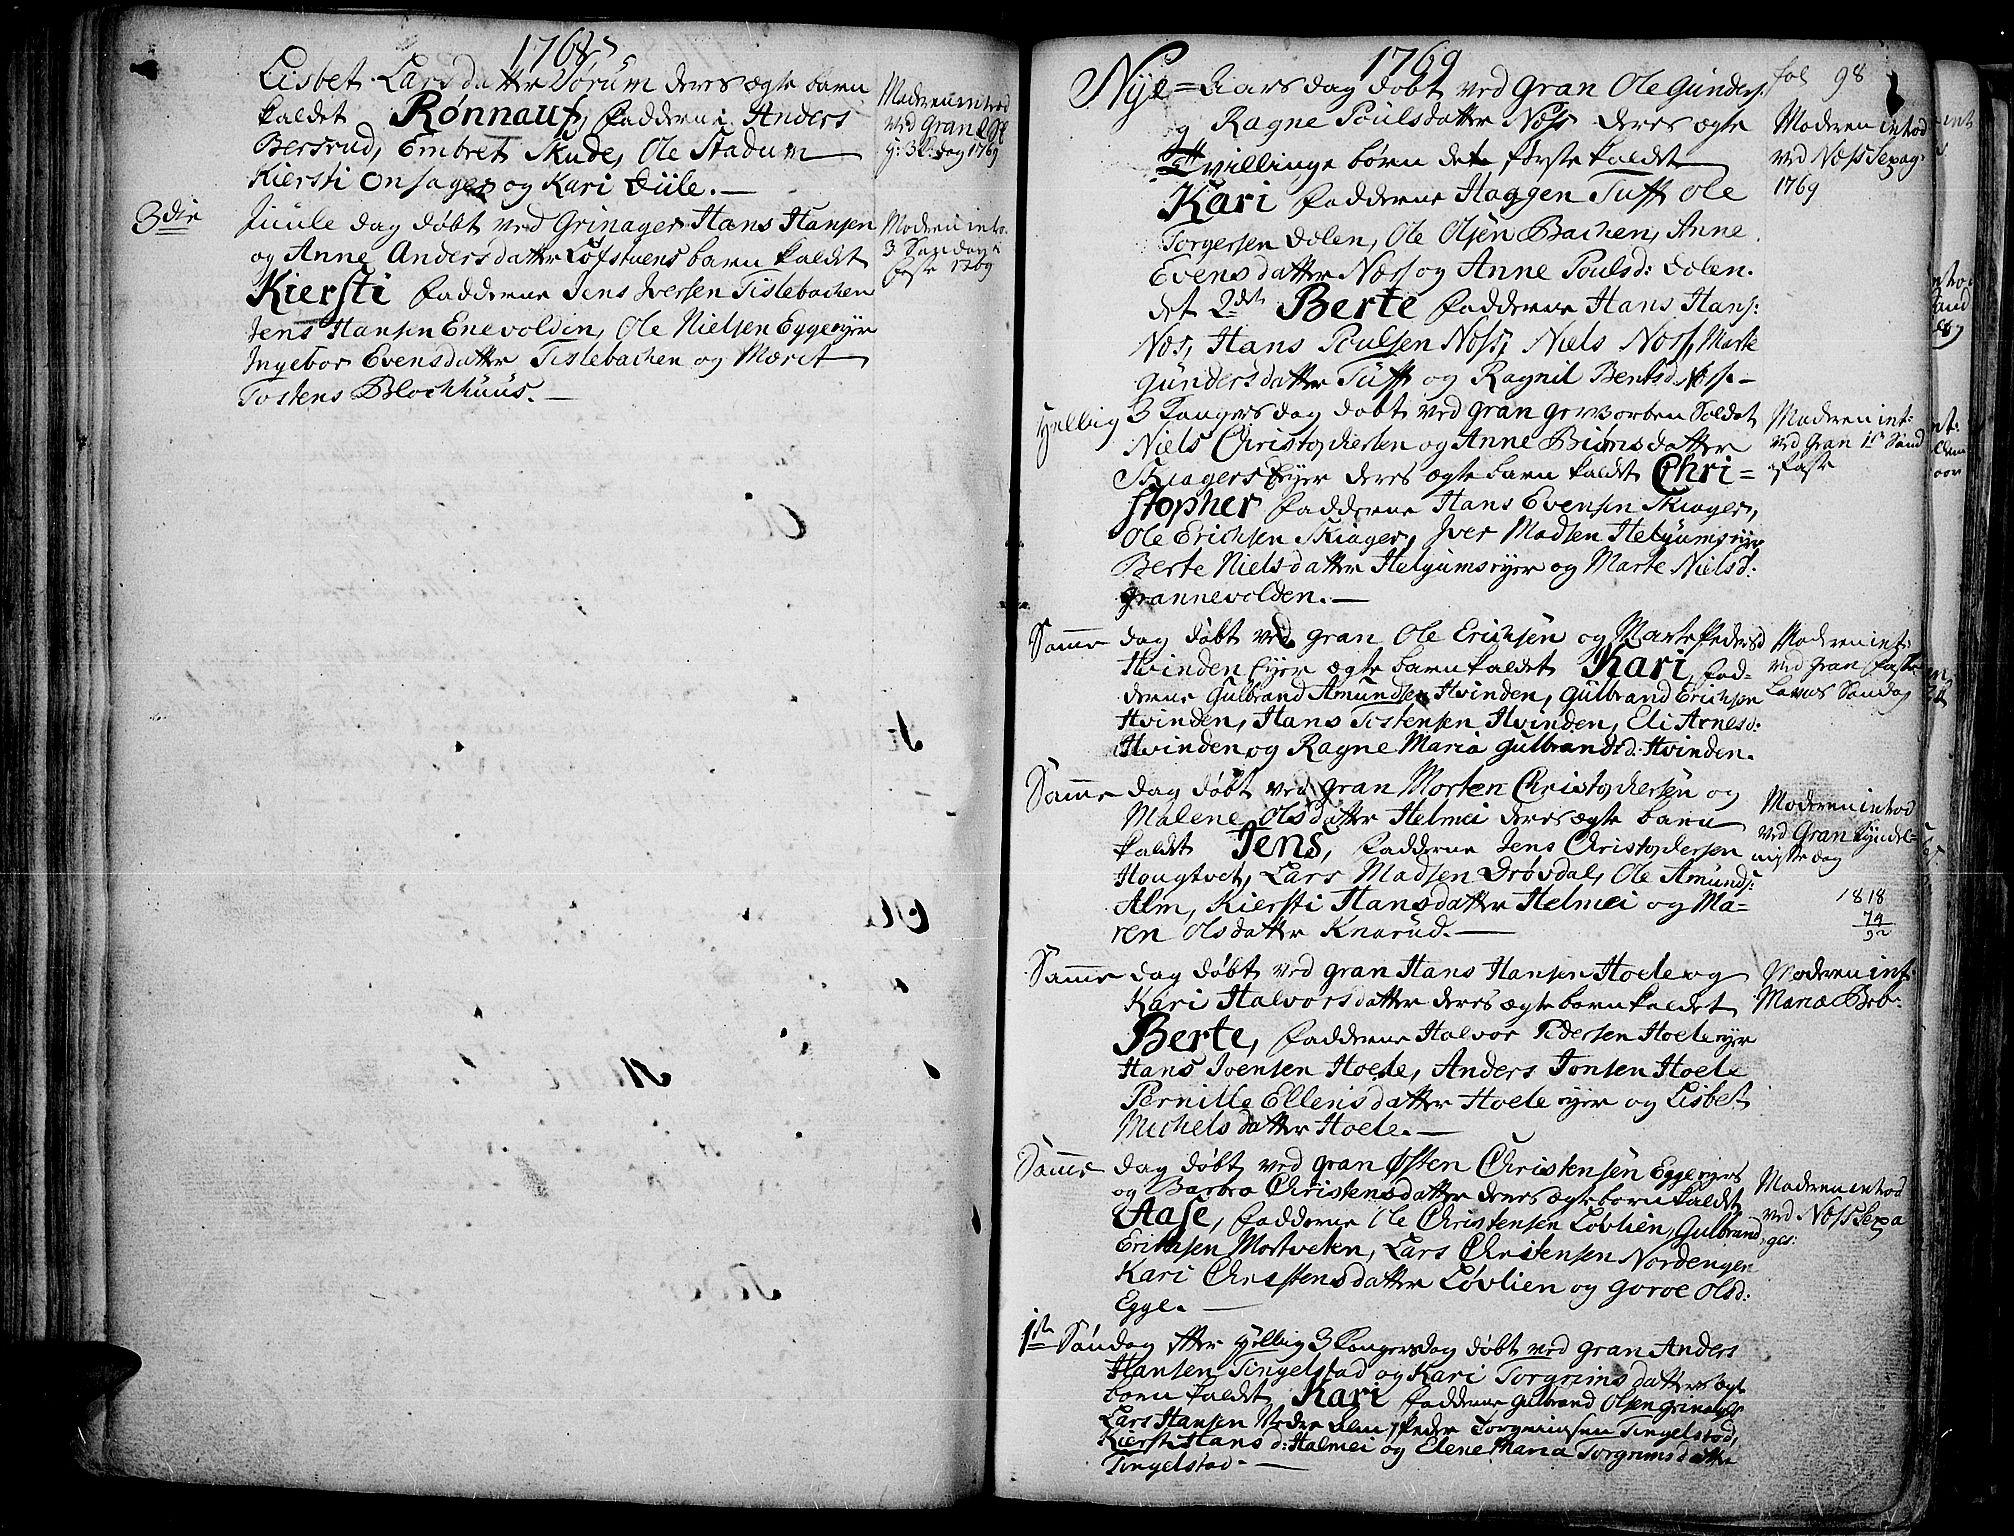 SAH, Gran prestekontor, Ministerialbok nr. 4, 1759-1775, s. 98